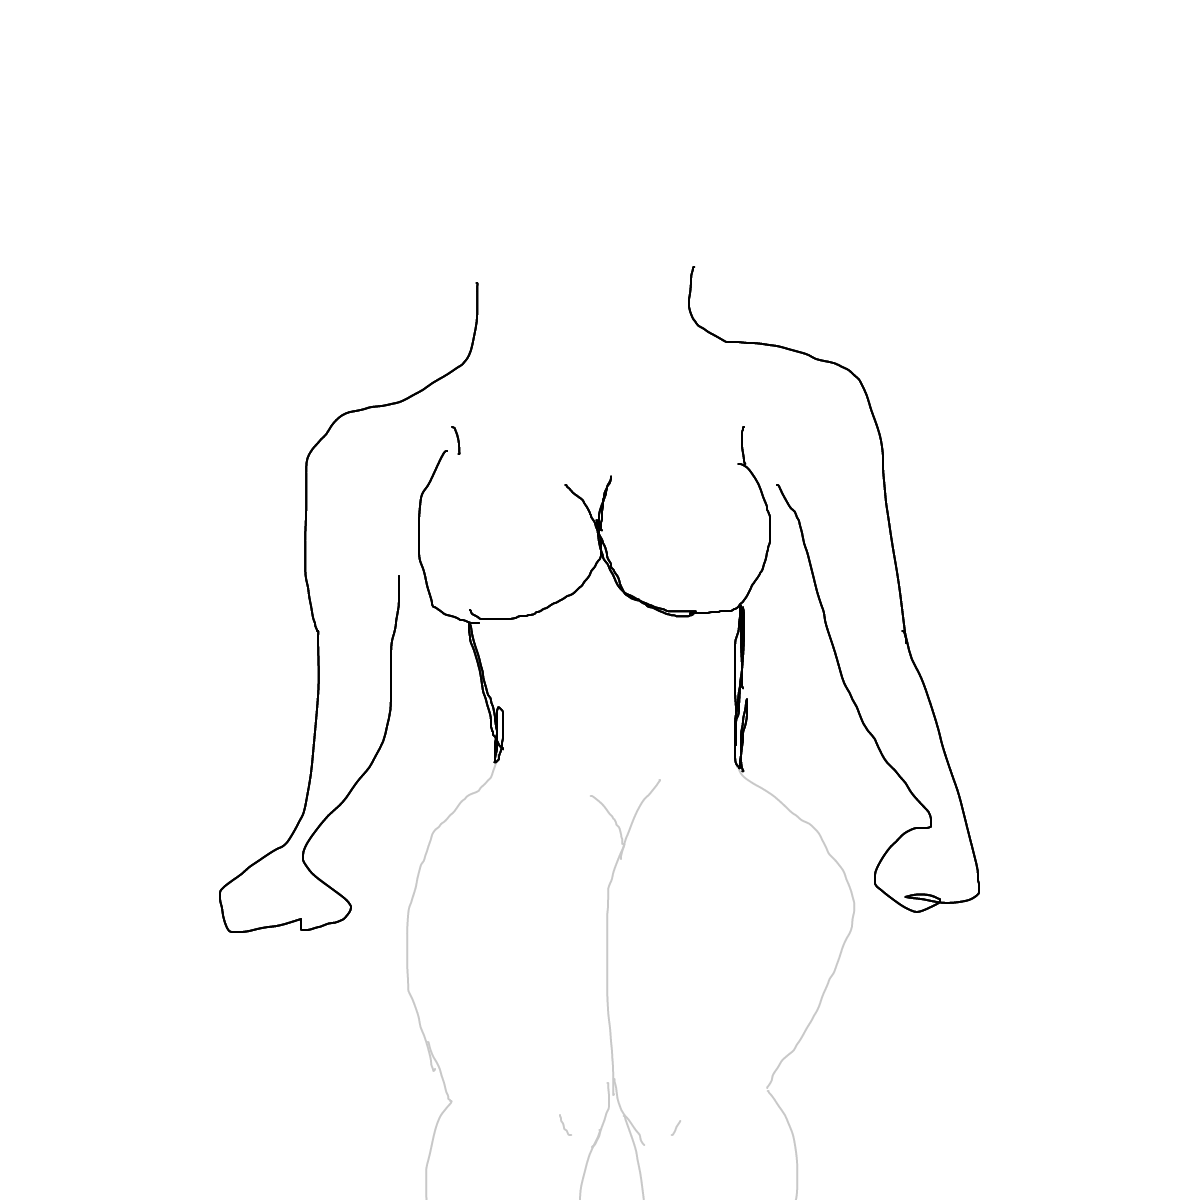 BAAAM drawing#24705 lat:-23.2223205566406250lng: 127.8391265869140600